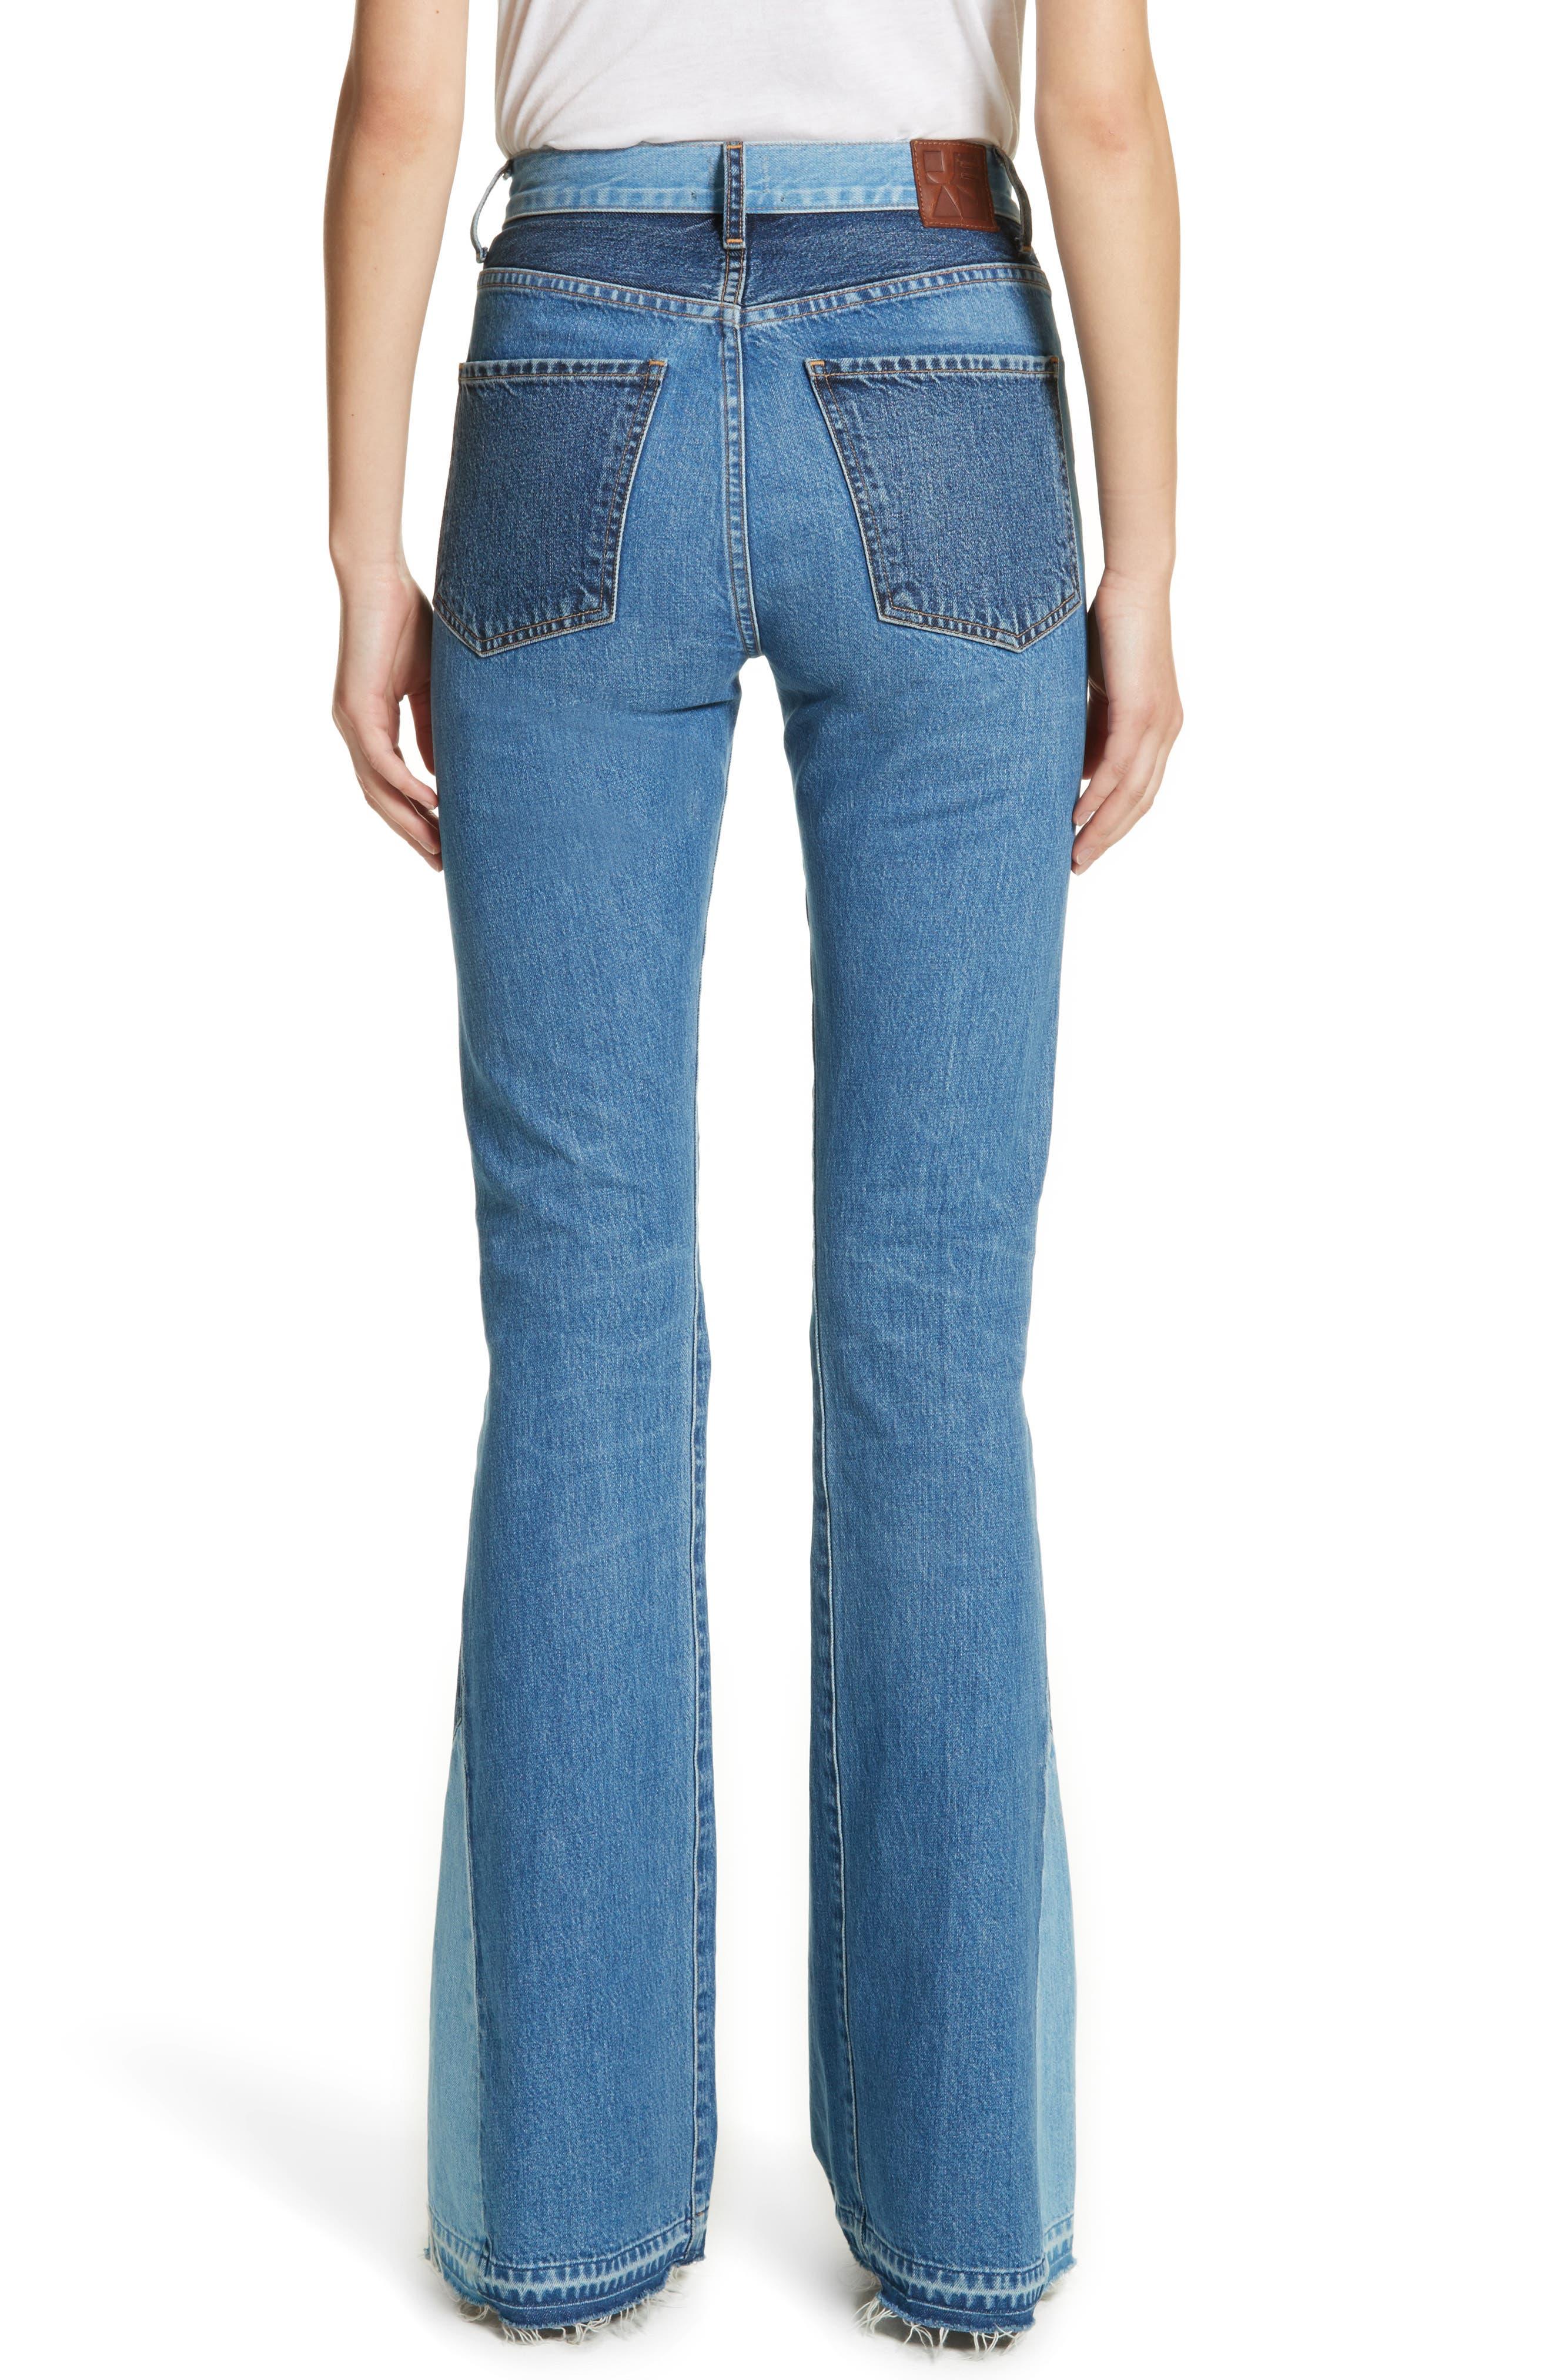 Alternate Image 3  - Jean Atelier Janis High Rise Flare Jeans (Jagger)